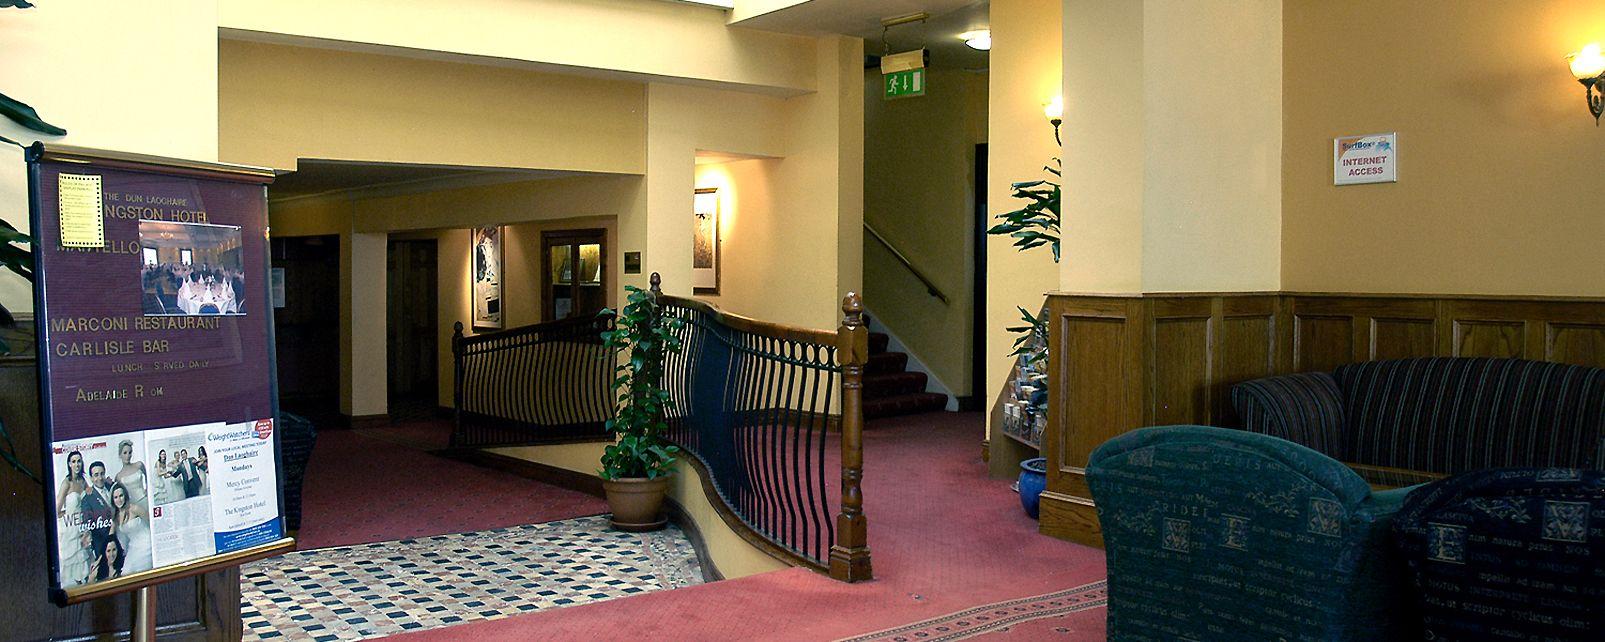 Hotel The Kingston